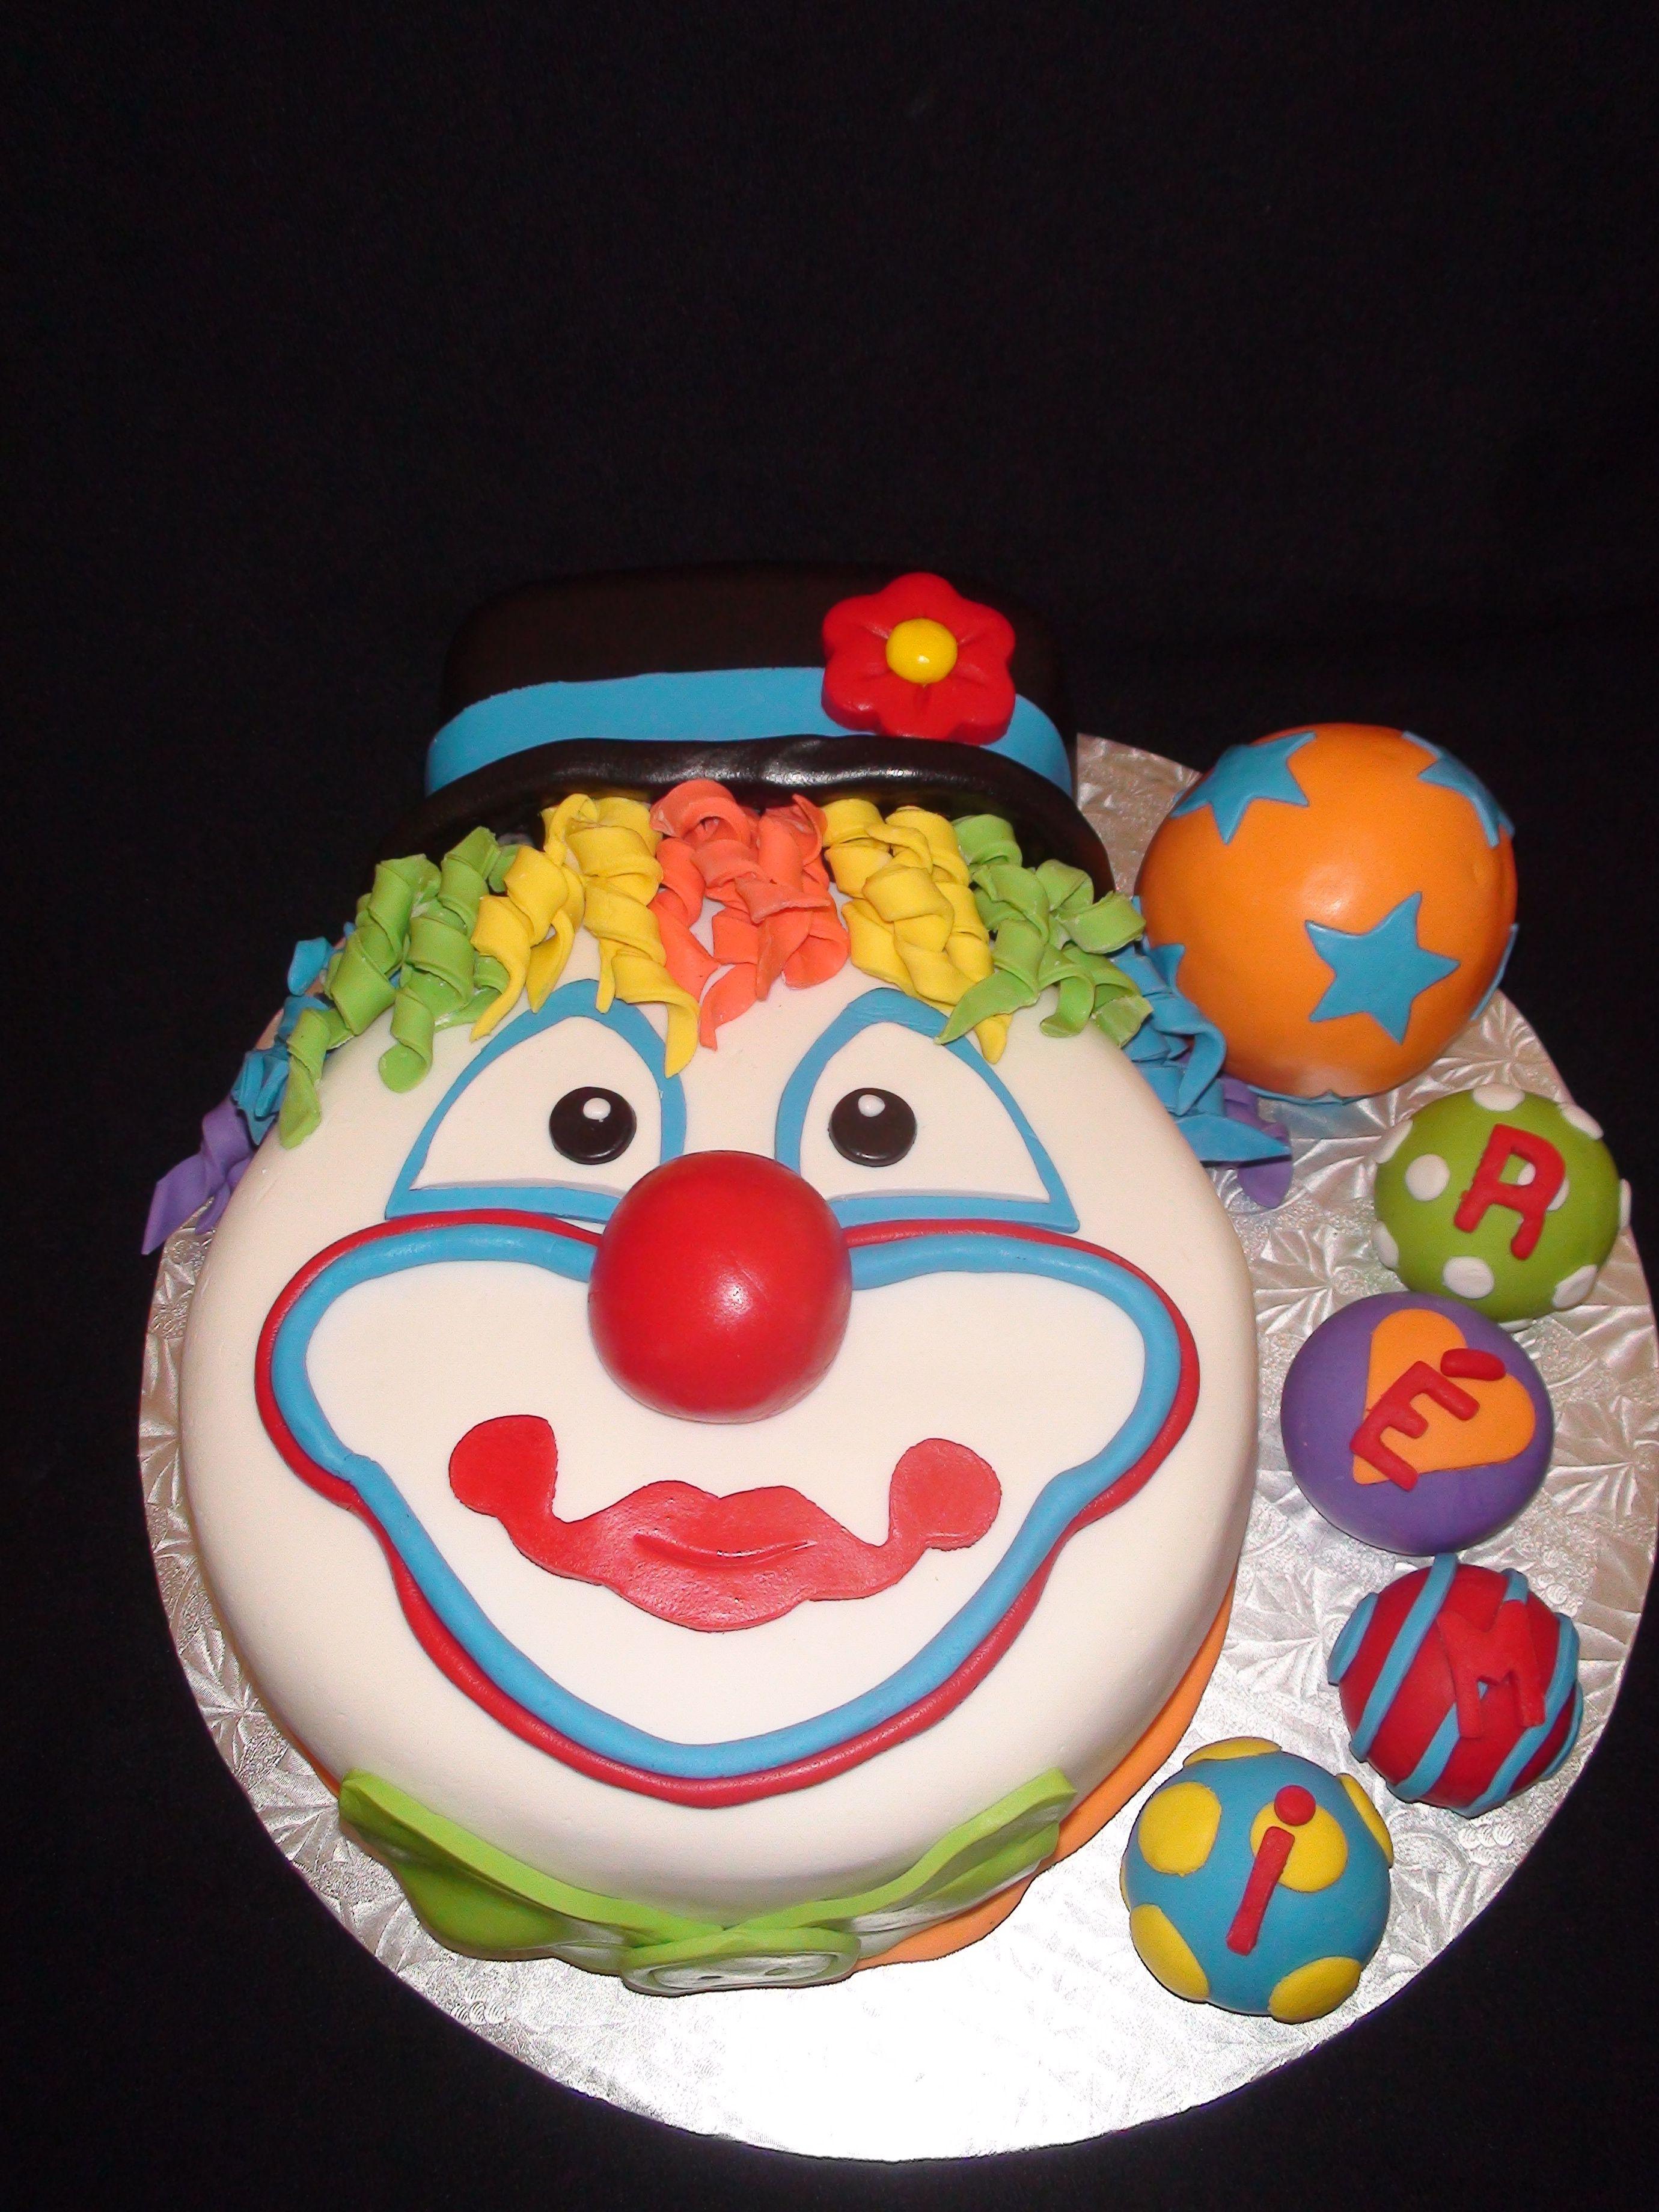 CLOWN JUGGLING BALL all edible Crafts for kids Pinterest